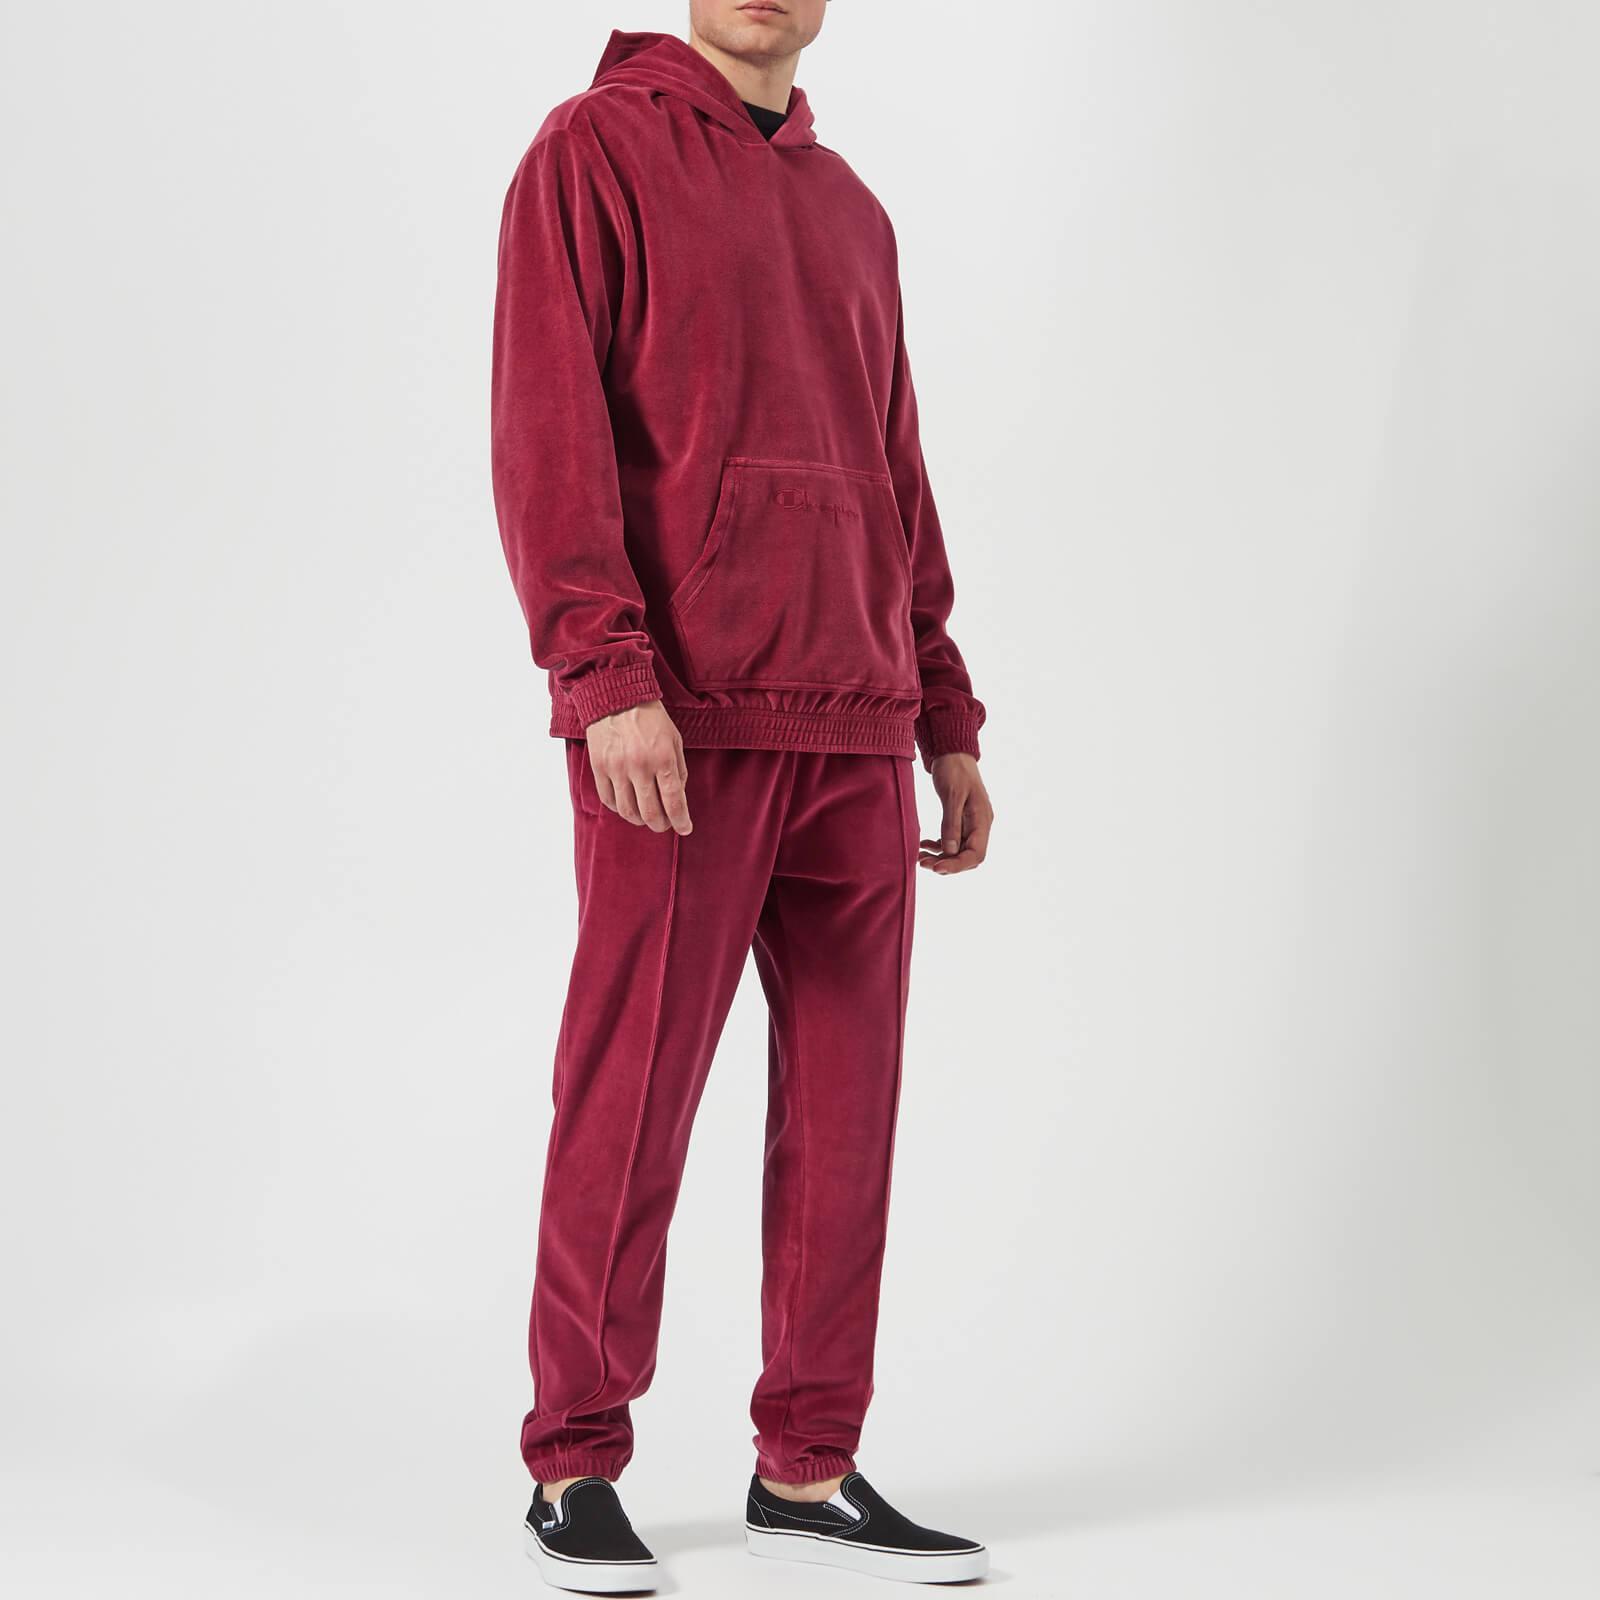 Men's Red Velour Track Pants